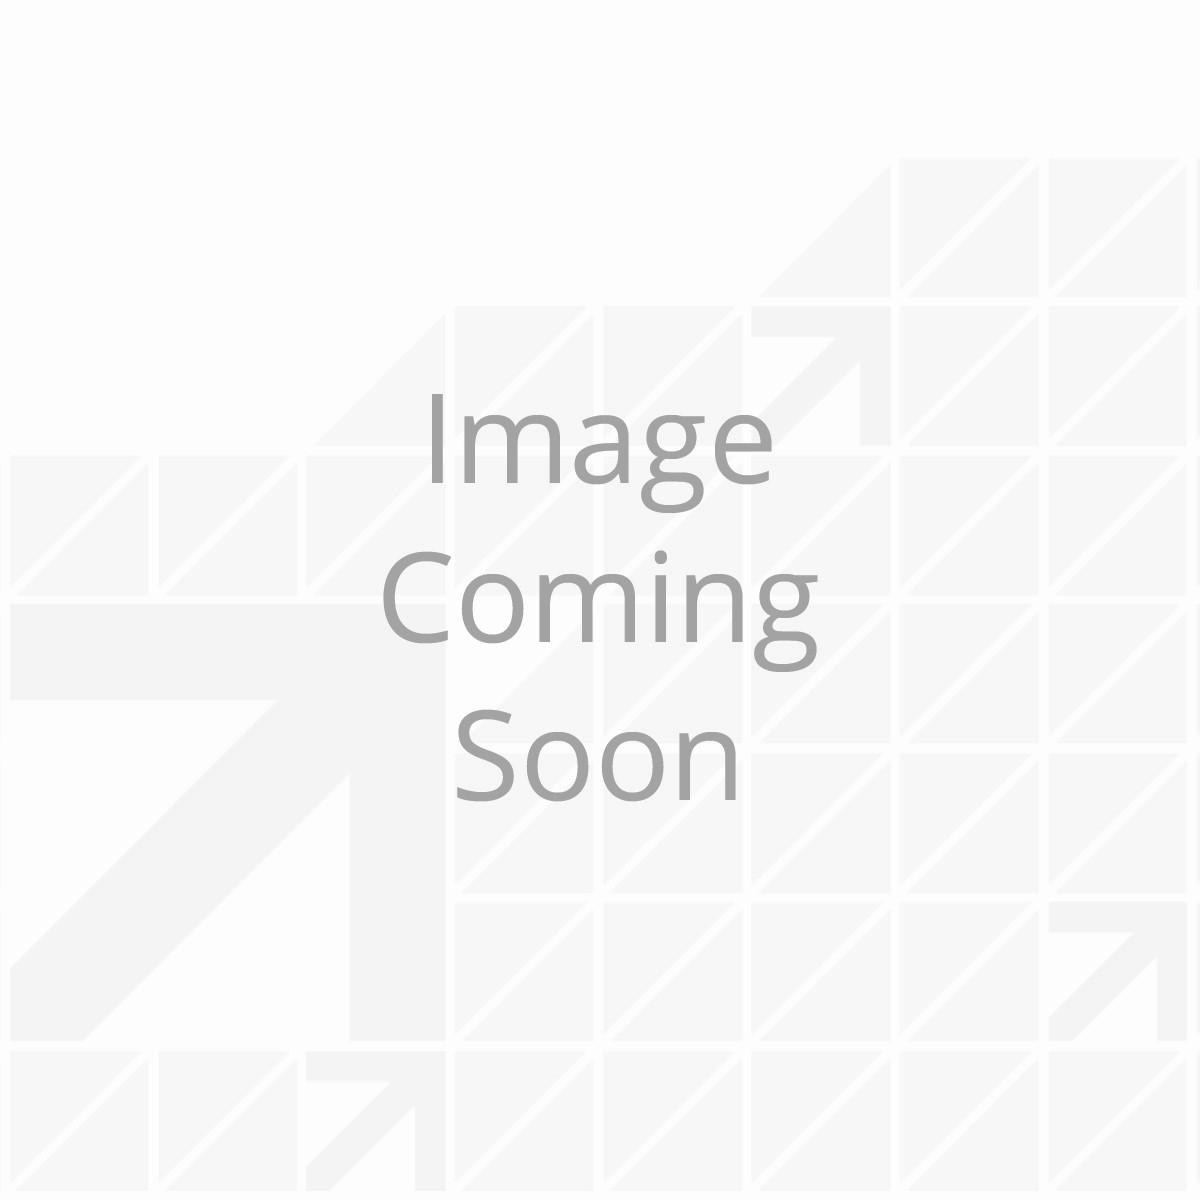 17' Destination Awning Roller Assembly - Black Fade (Black Shield)